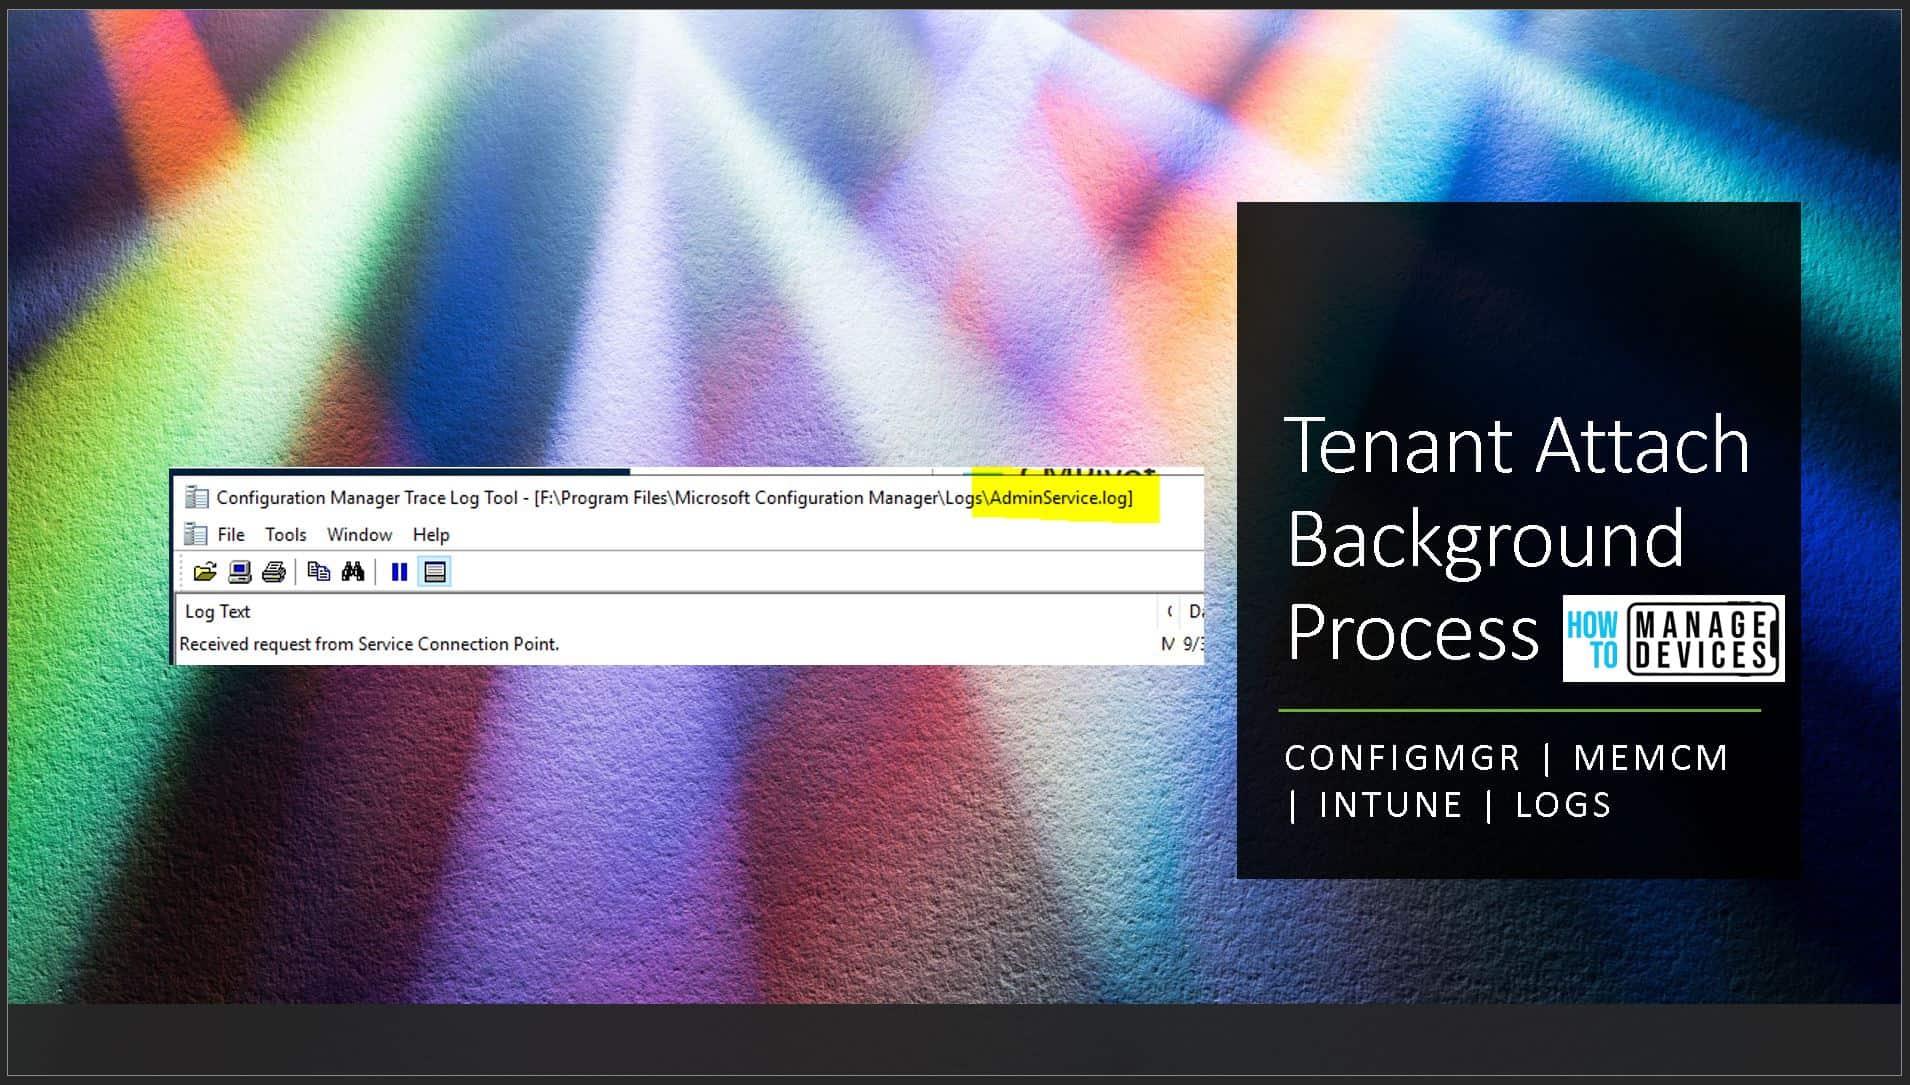 SCCM Tenant Attach Background Process